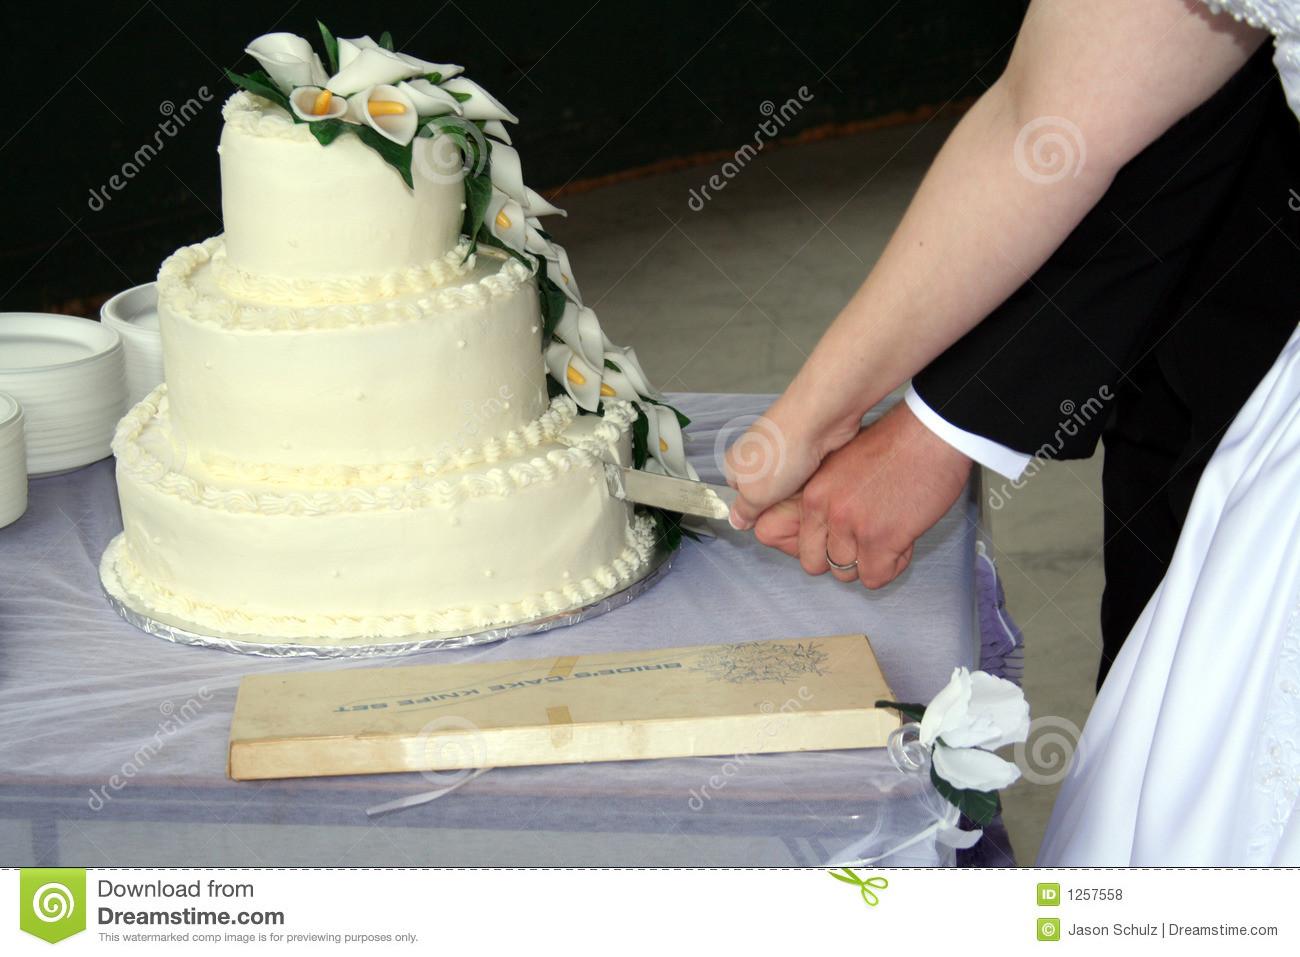 Wedding Cakes Cutting  Bride And Groom Cutting Wedding Cake Royalty Free Stock